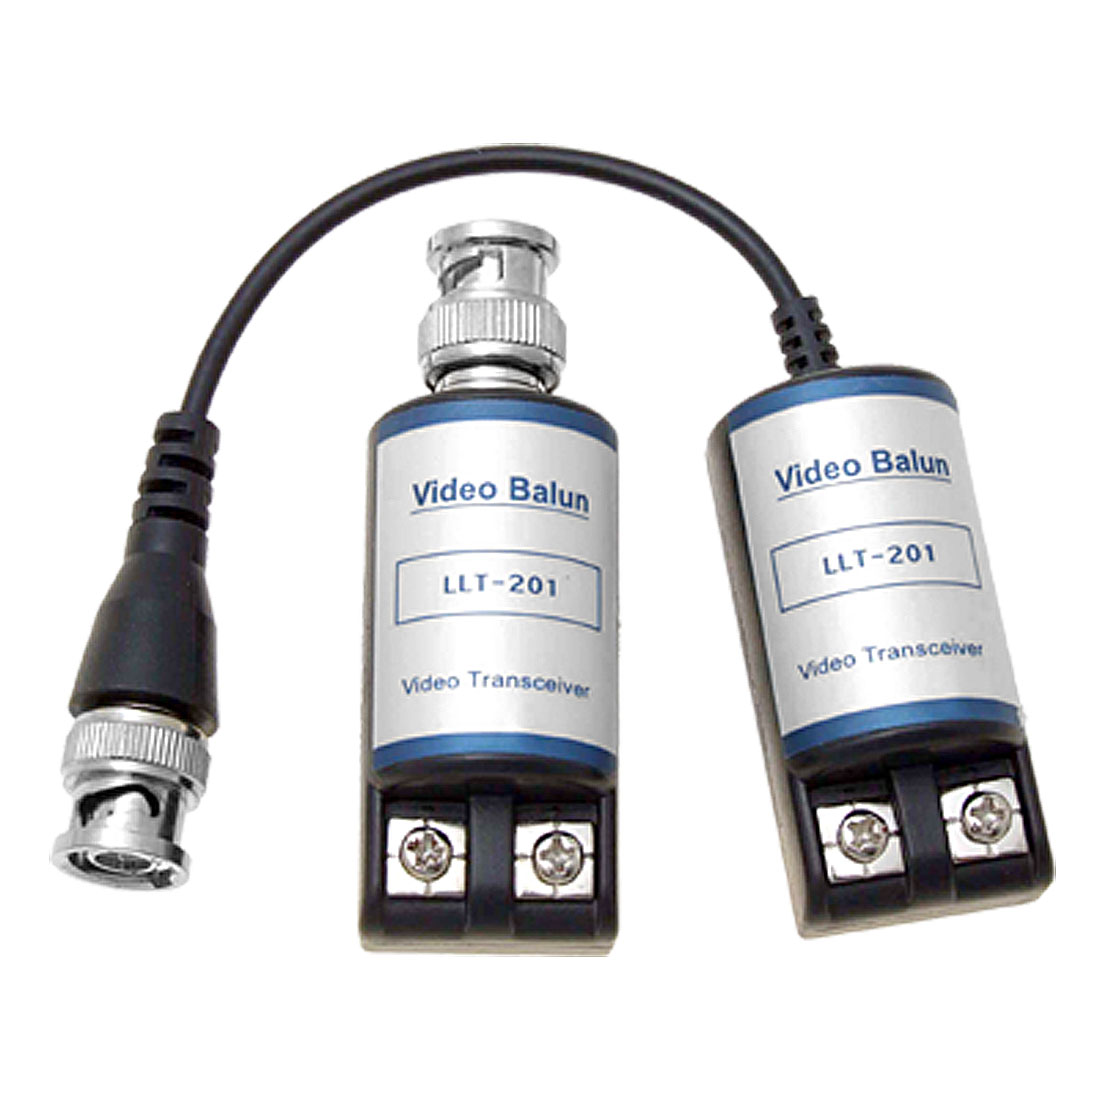 2 BNC Balun Video Coax UTP Transmission Kit for CCTV Camera